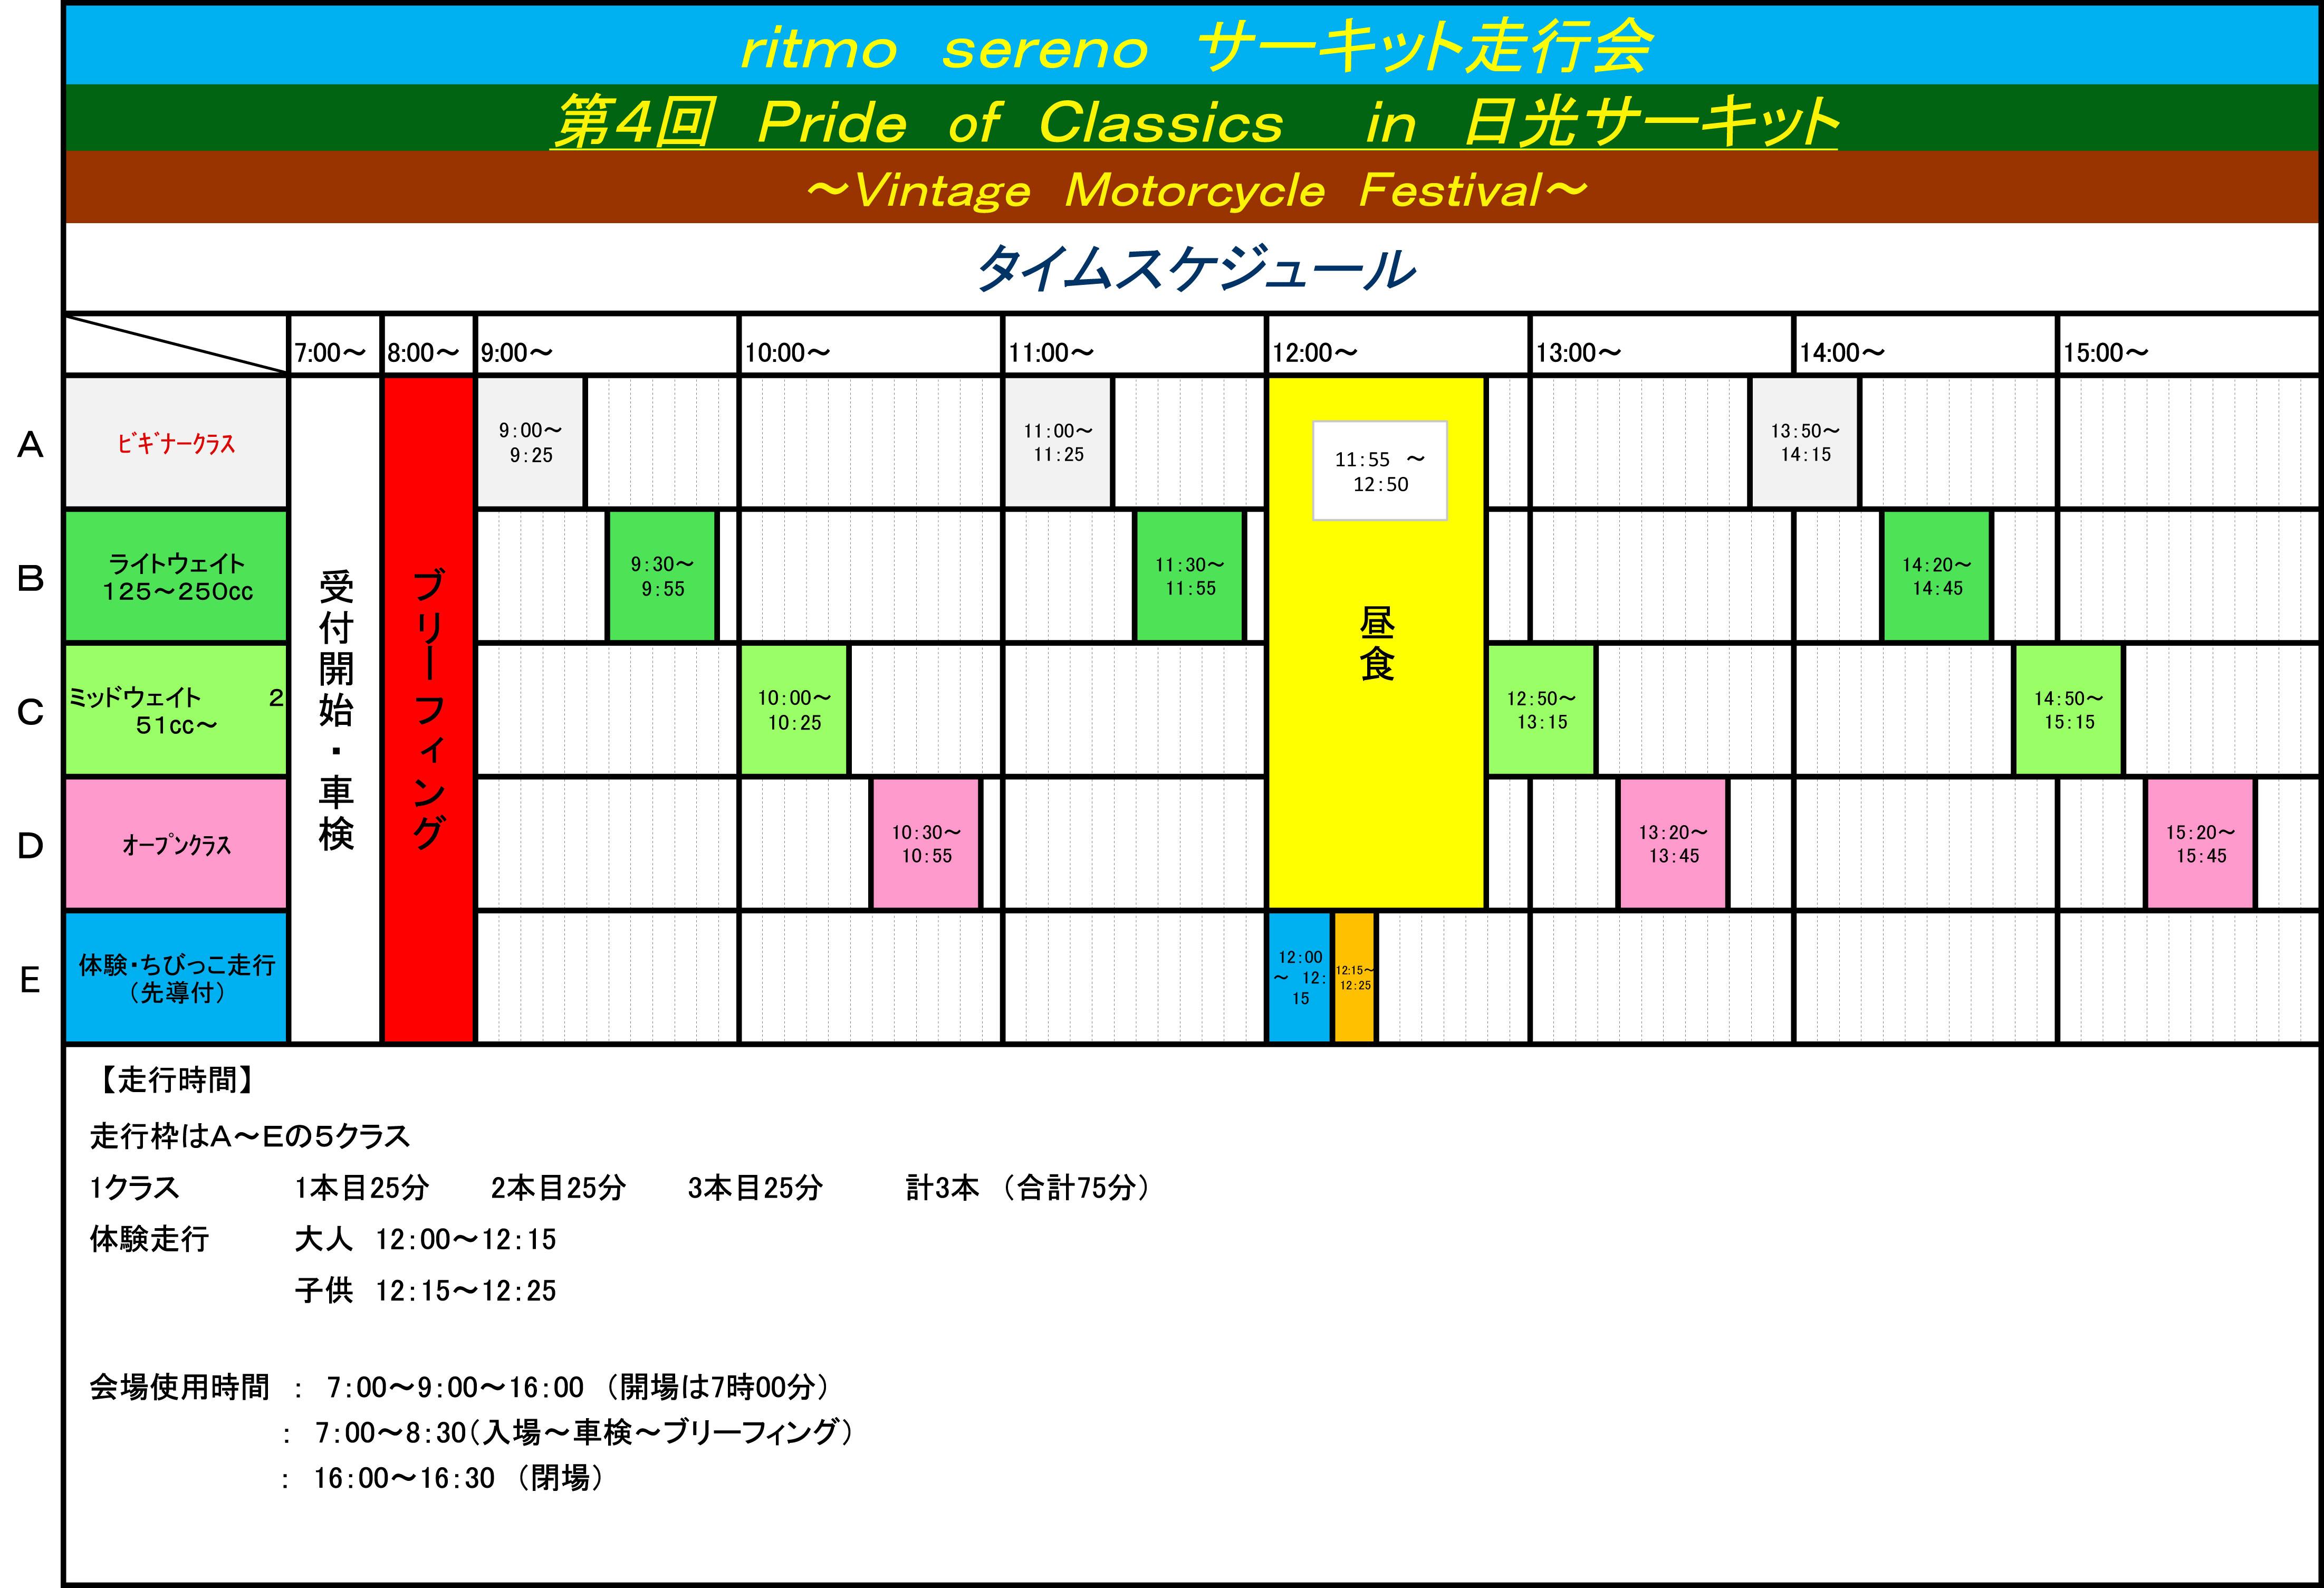 http://www.ritmo-sereno.com/46blog/%E6%96%B0%E3%82%BF%E3%82%A4%E3%82%B9%E3%82%B1.jpg